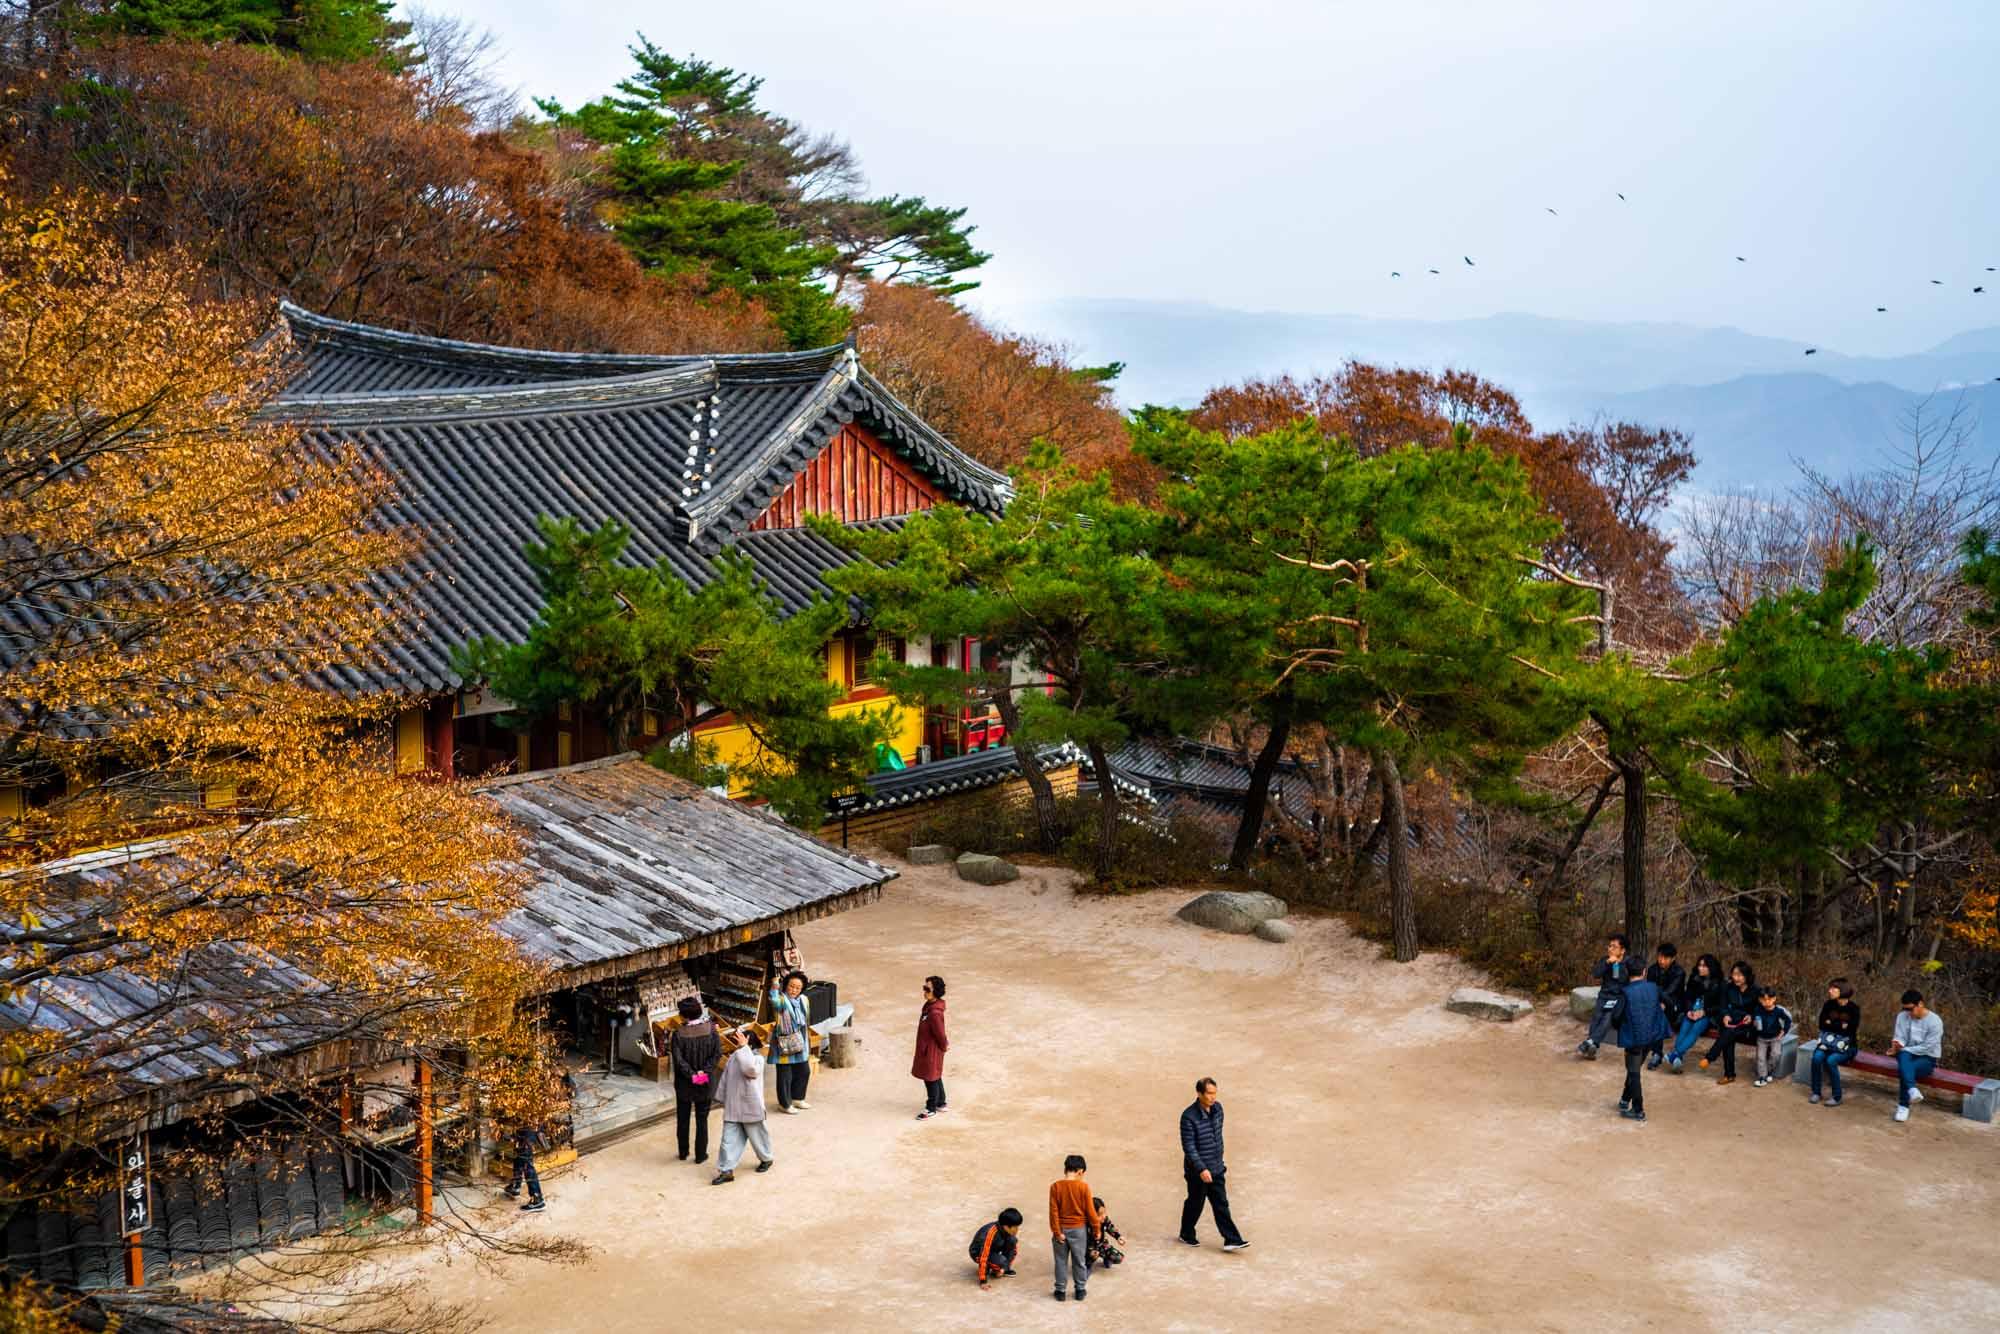 gyeongju-day-night-denis-bosnic-37.jpg